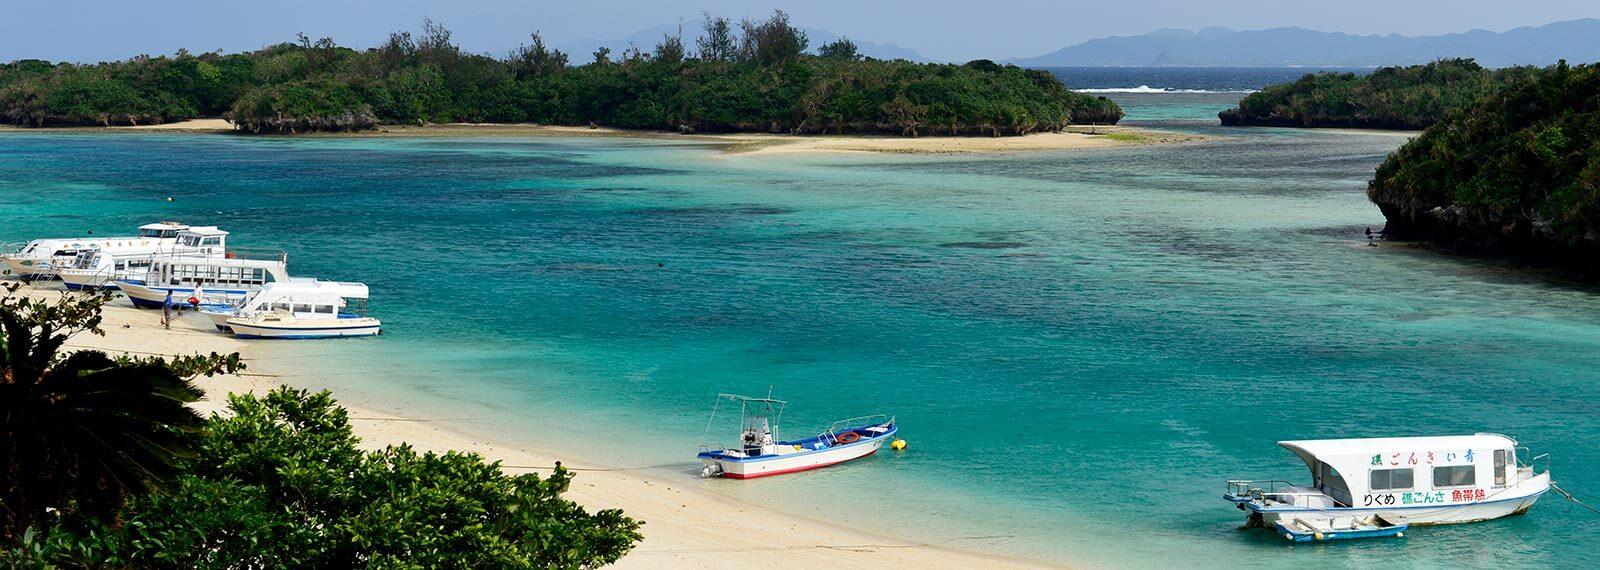 Iriomote Ishigaki National Park Visit Okinawa Japan